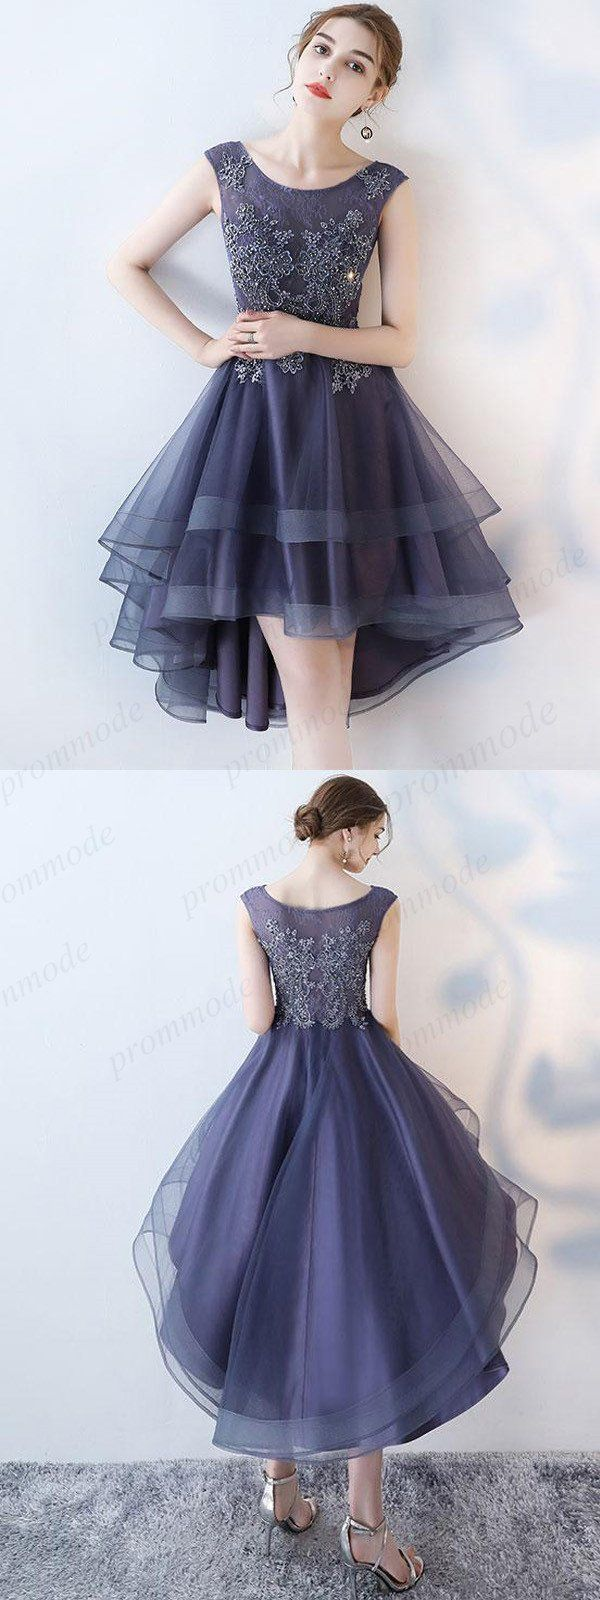 Purple Hi-lo Beaded Lace Homecoming Dresses,Unique Short Prom Dresses,BDY0215